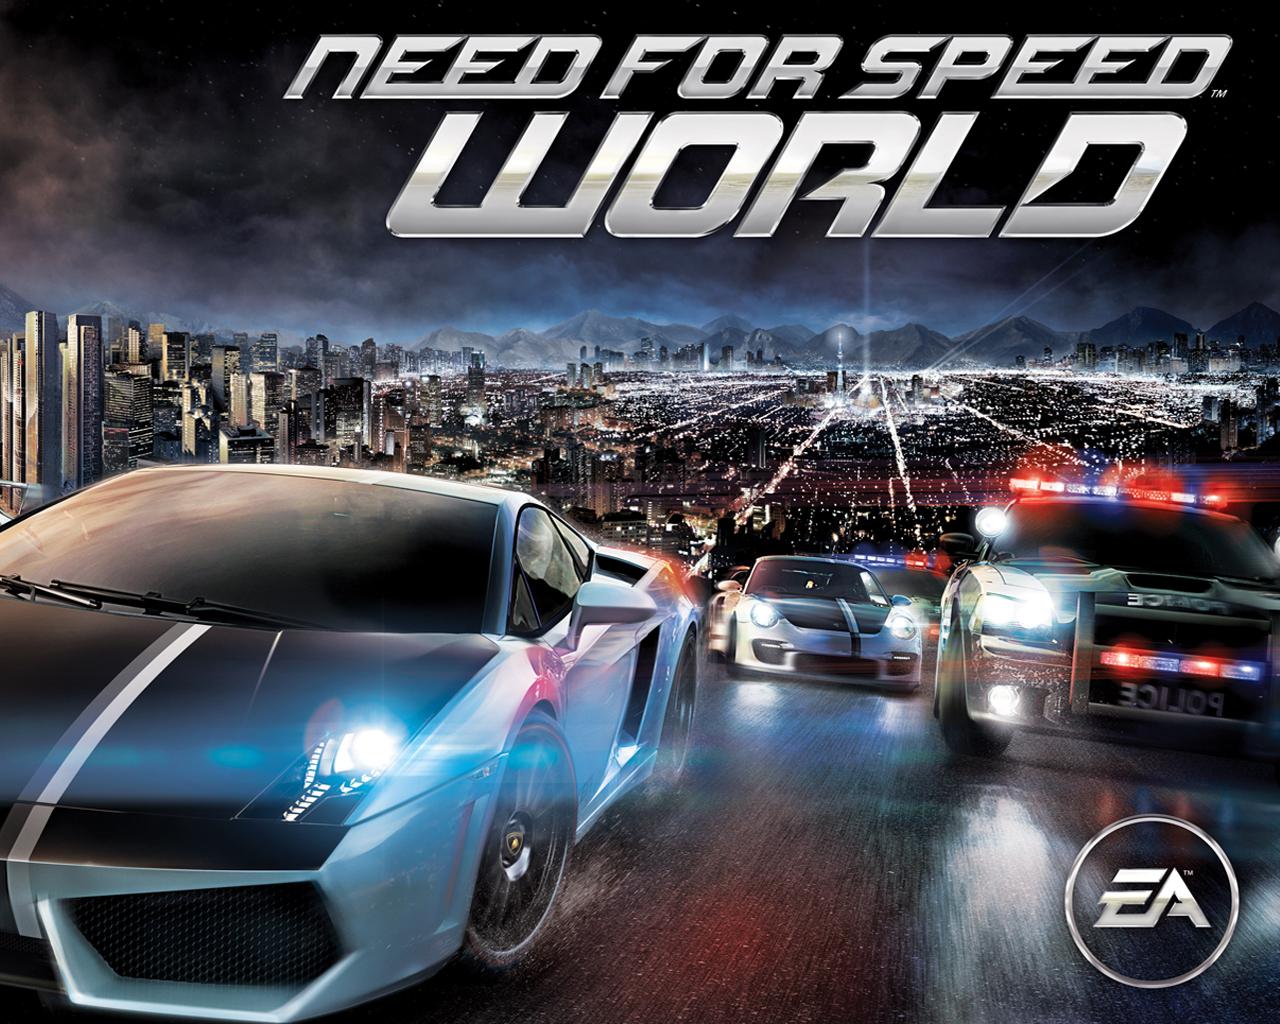 igray-need-for-speed